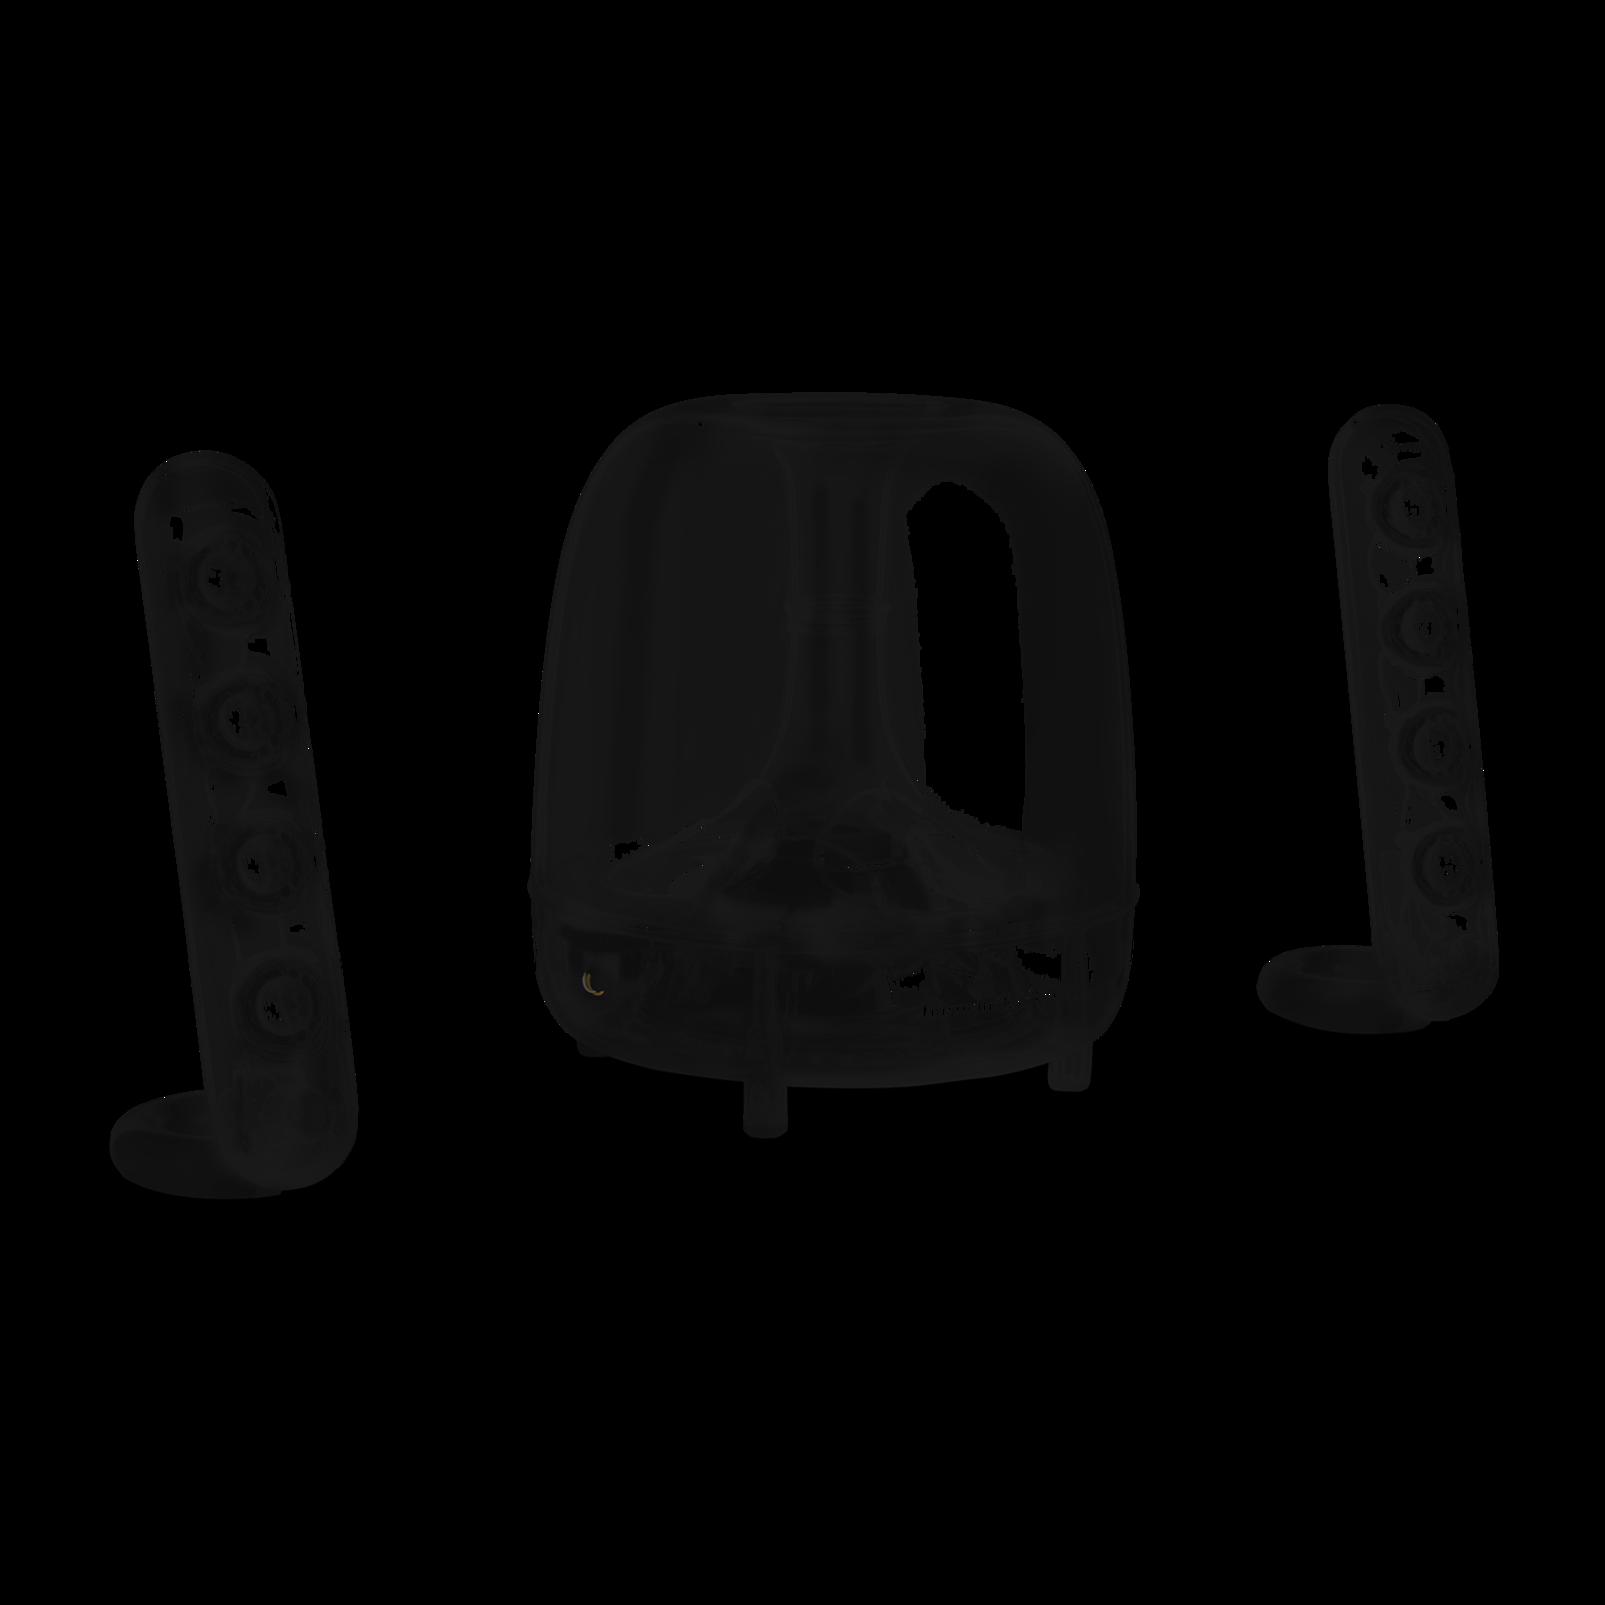 SoundSticks Wireless - Clear - Three-piece wireless speaker system with Bluetooth - Detailshot 1